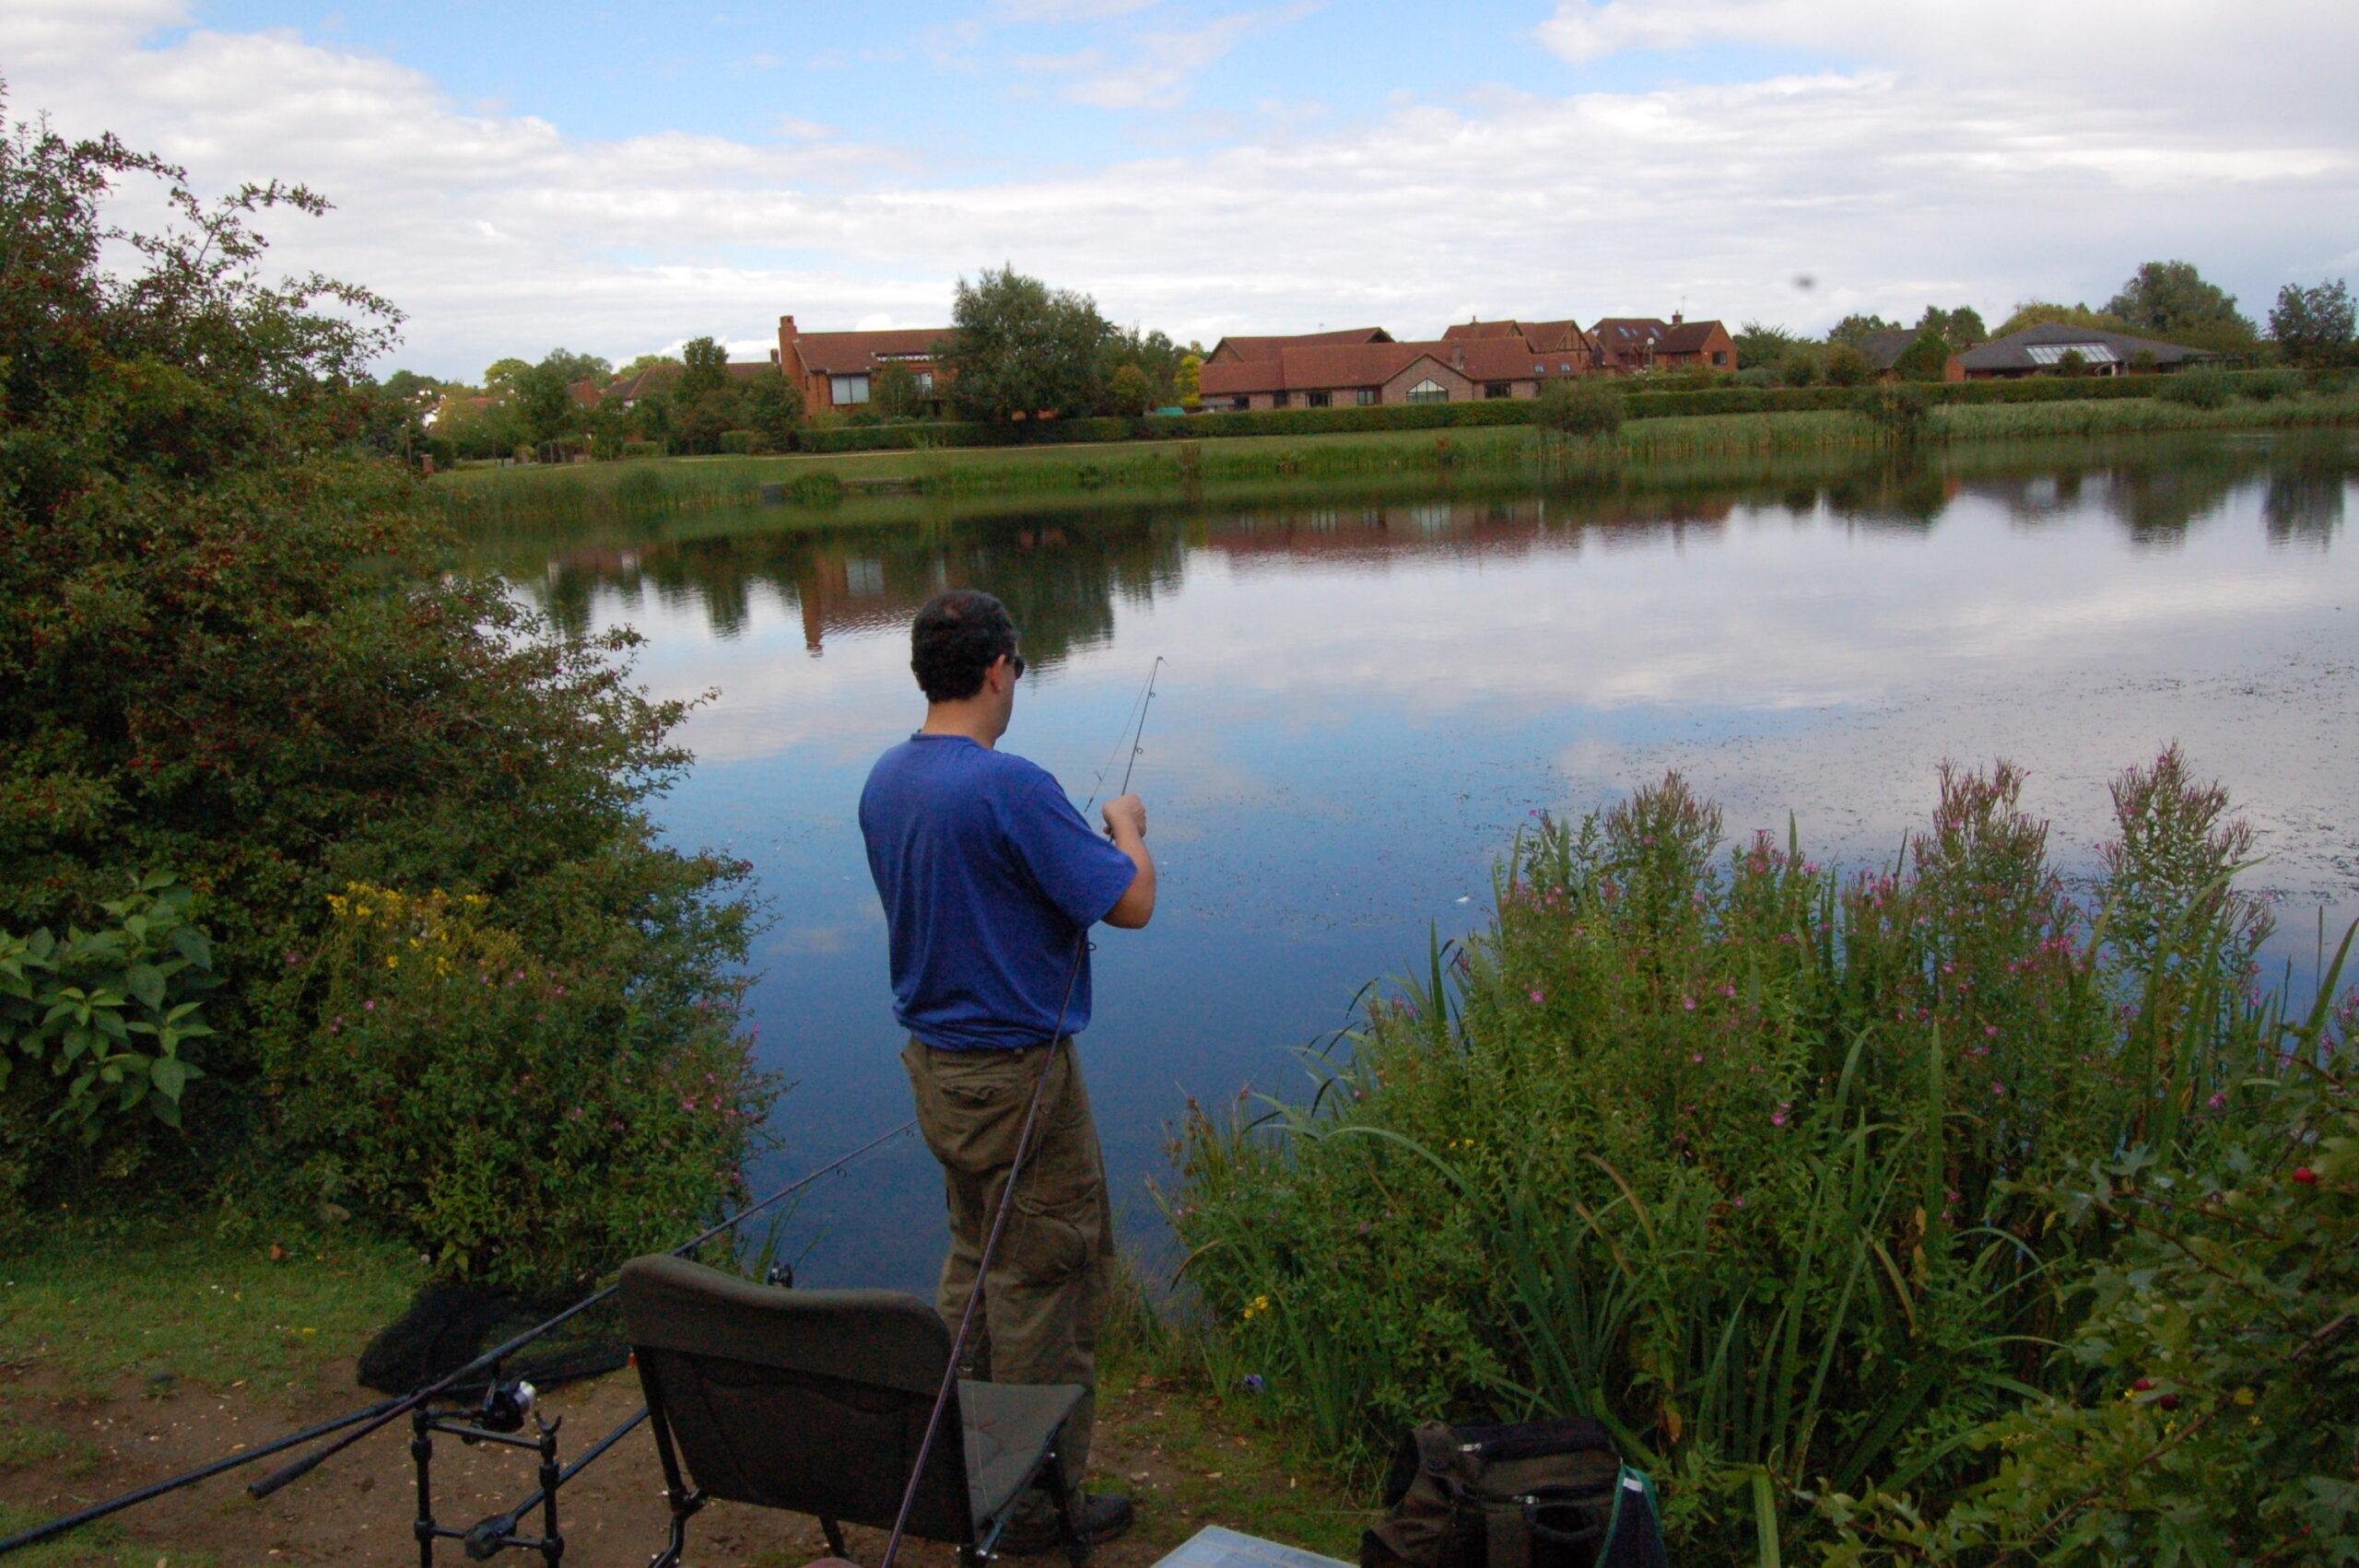 Fishing in Milton Keynes